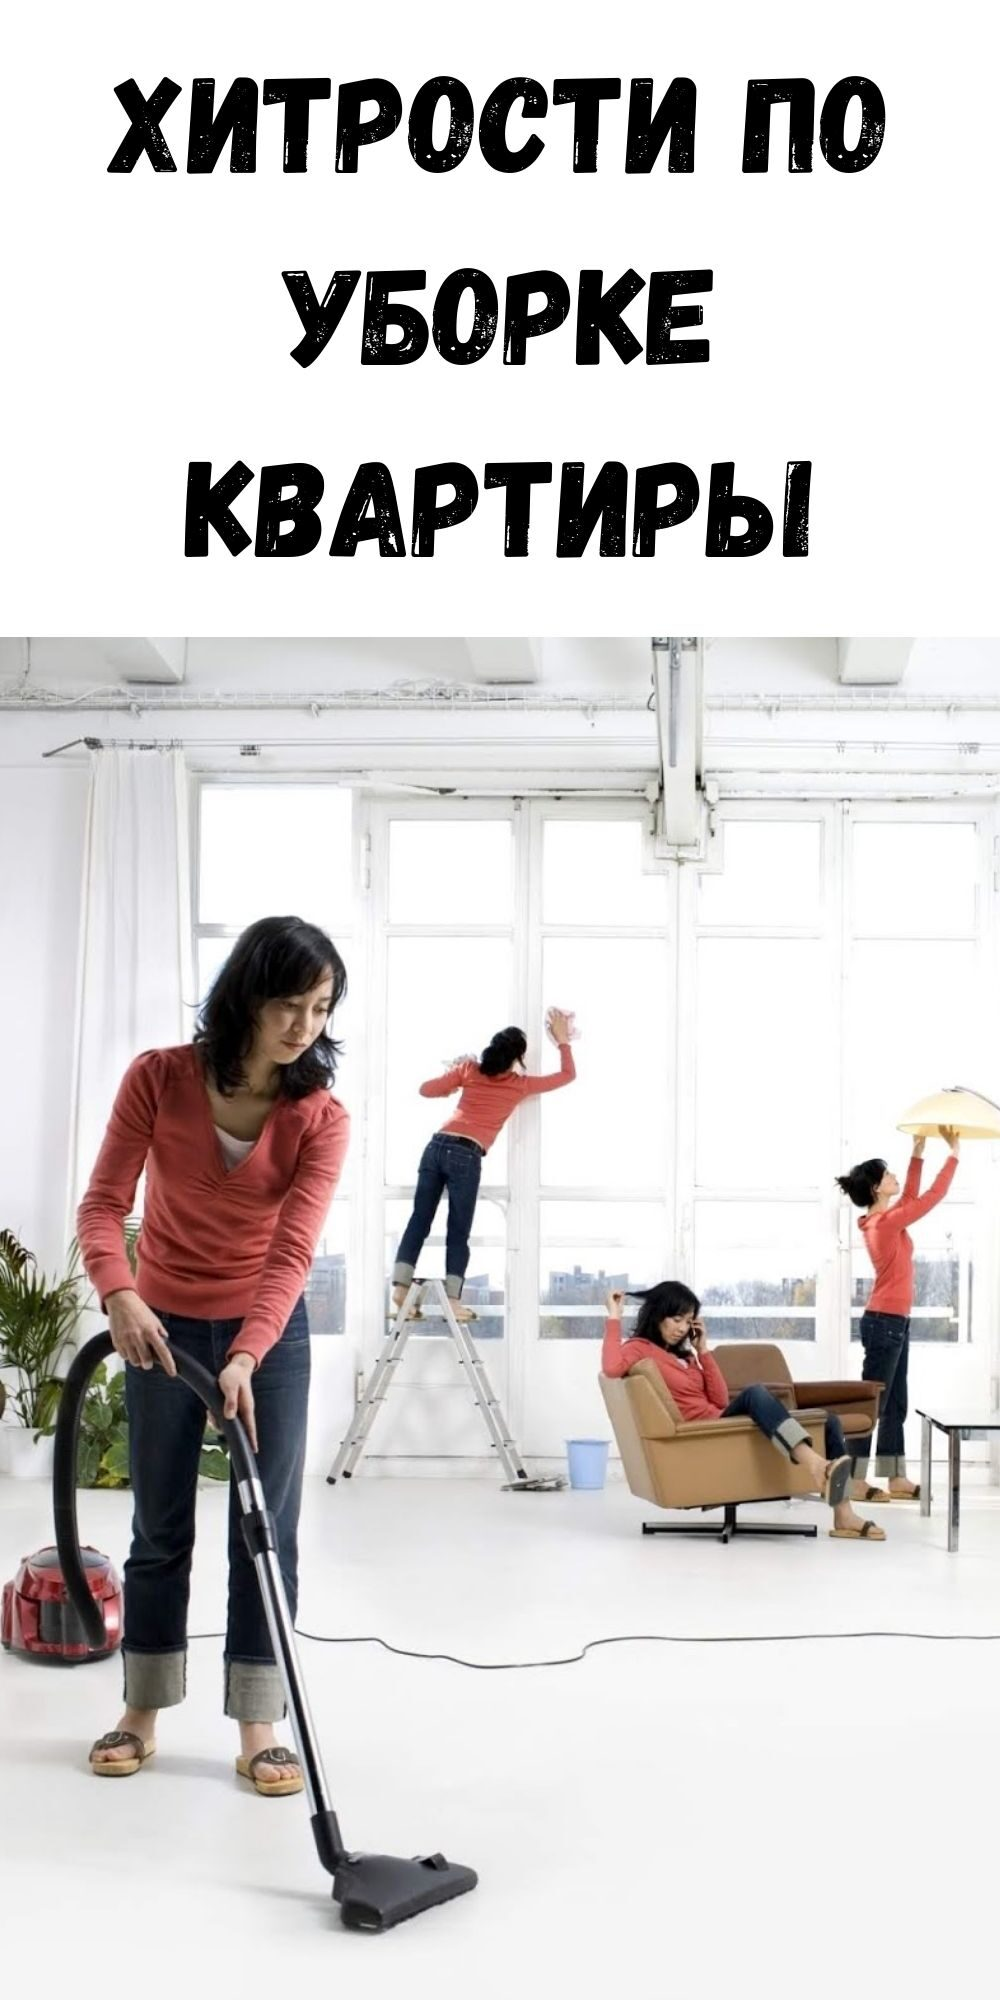 hitrosti-po-uborke-kvartiry-1813507